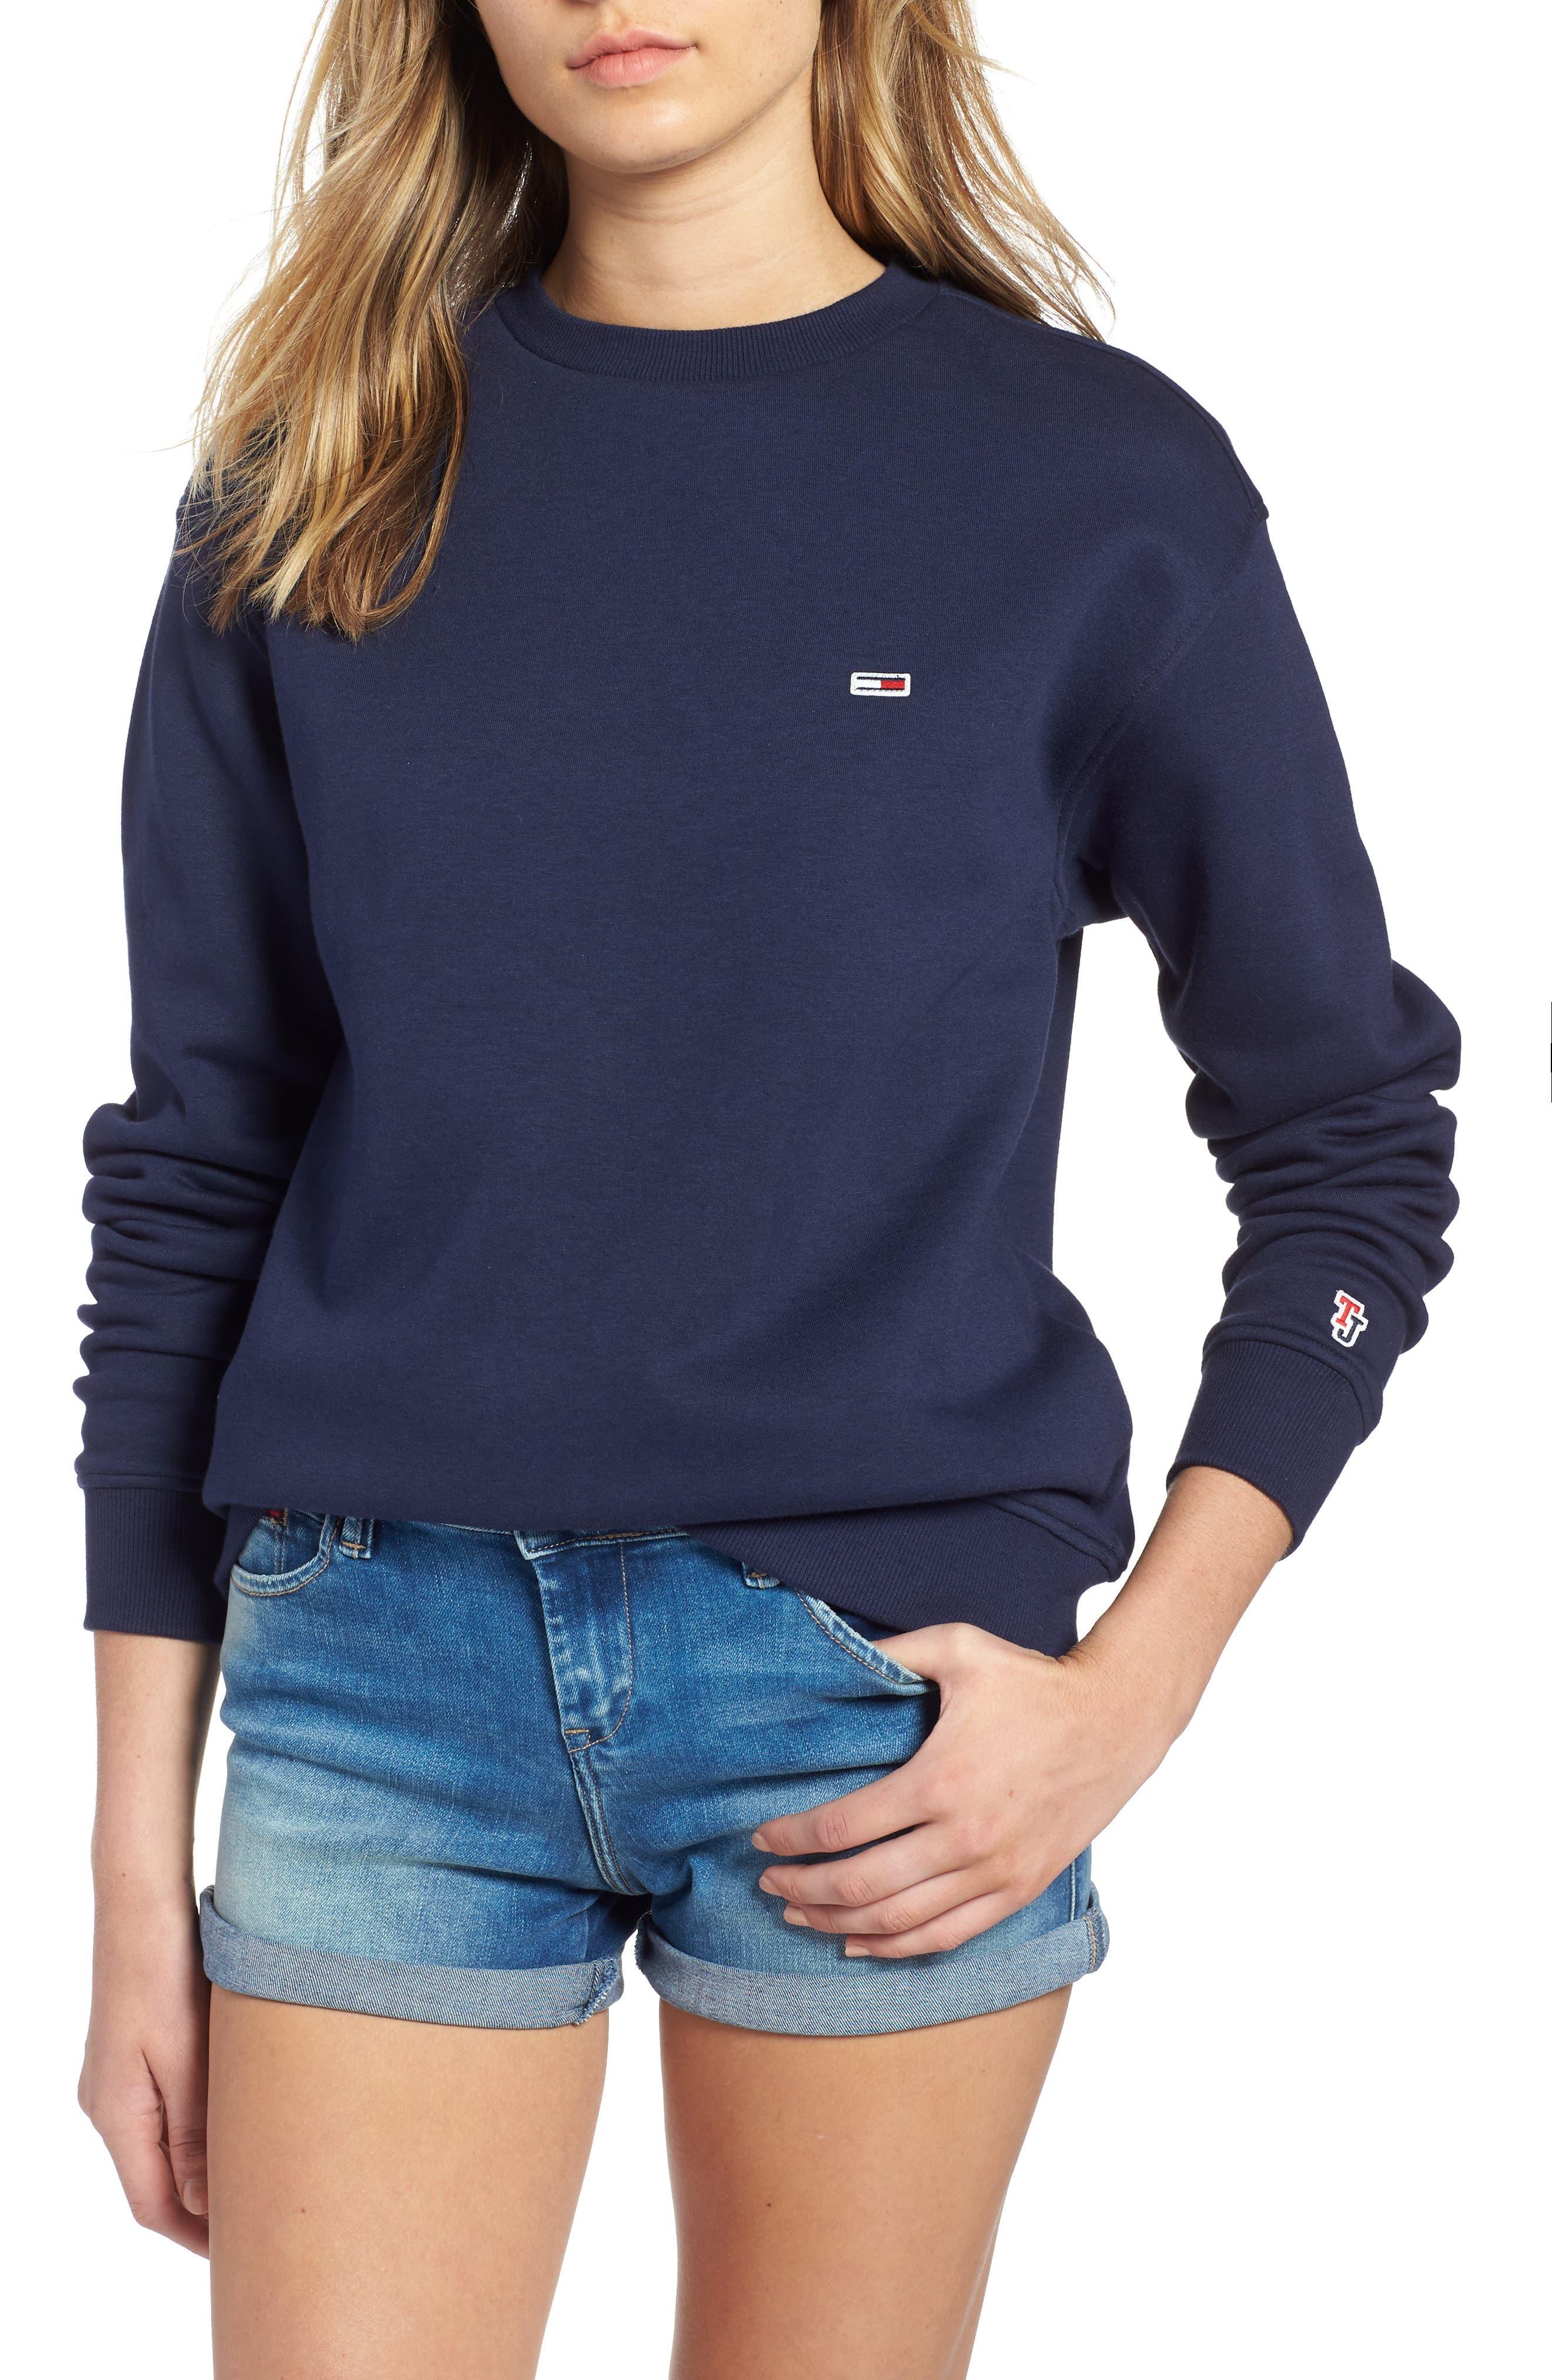 TJW Tommy Classics Sweatshirt,                             Main thumbnail 1, color,                             002